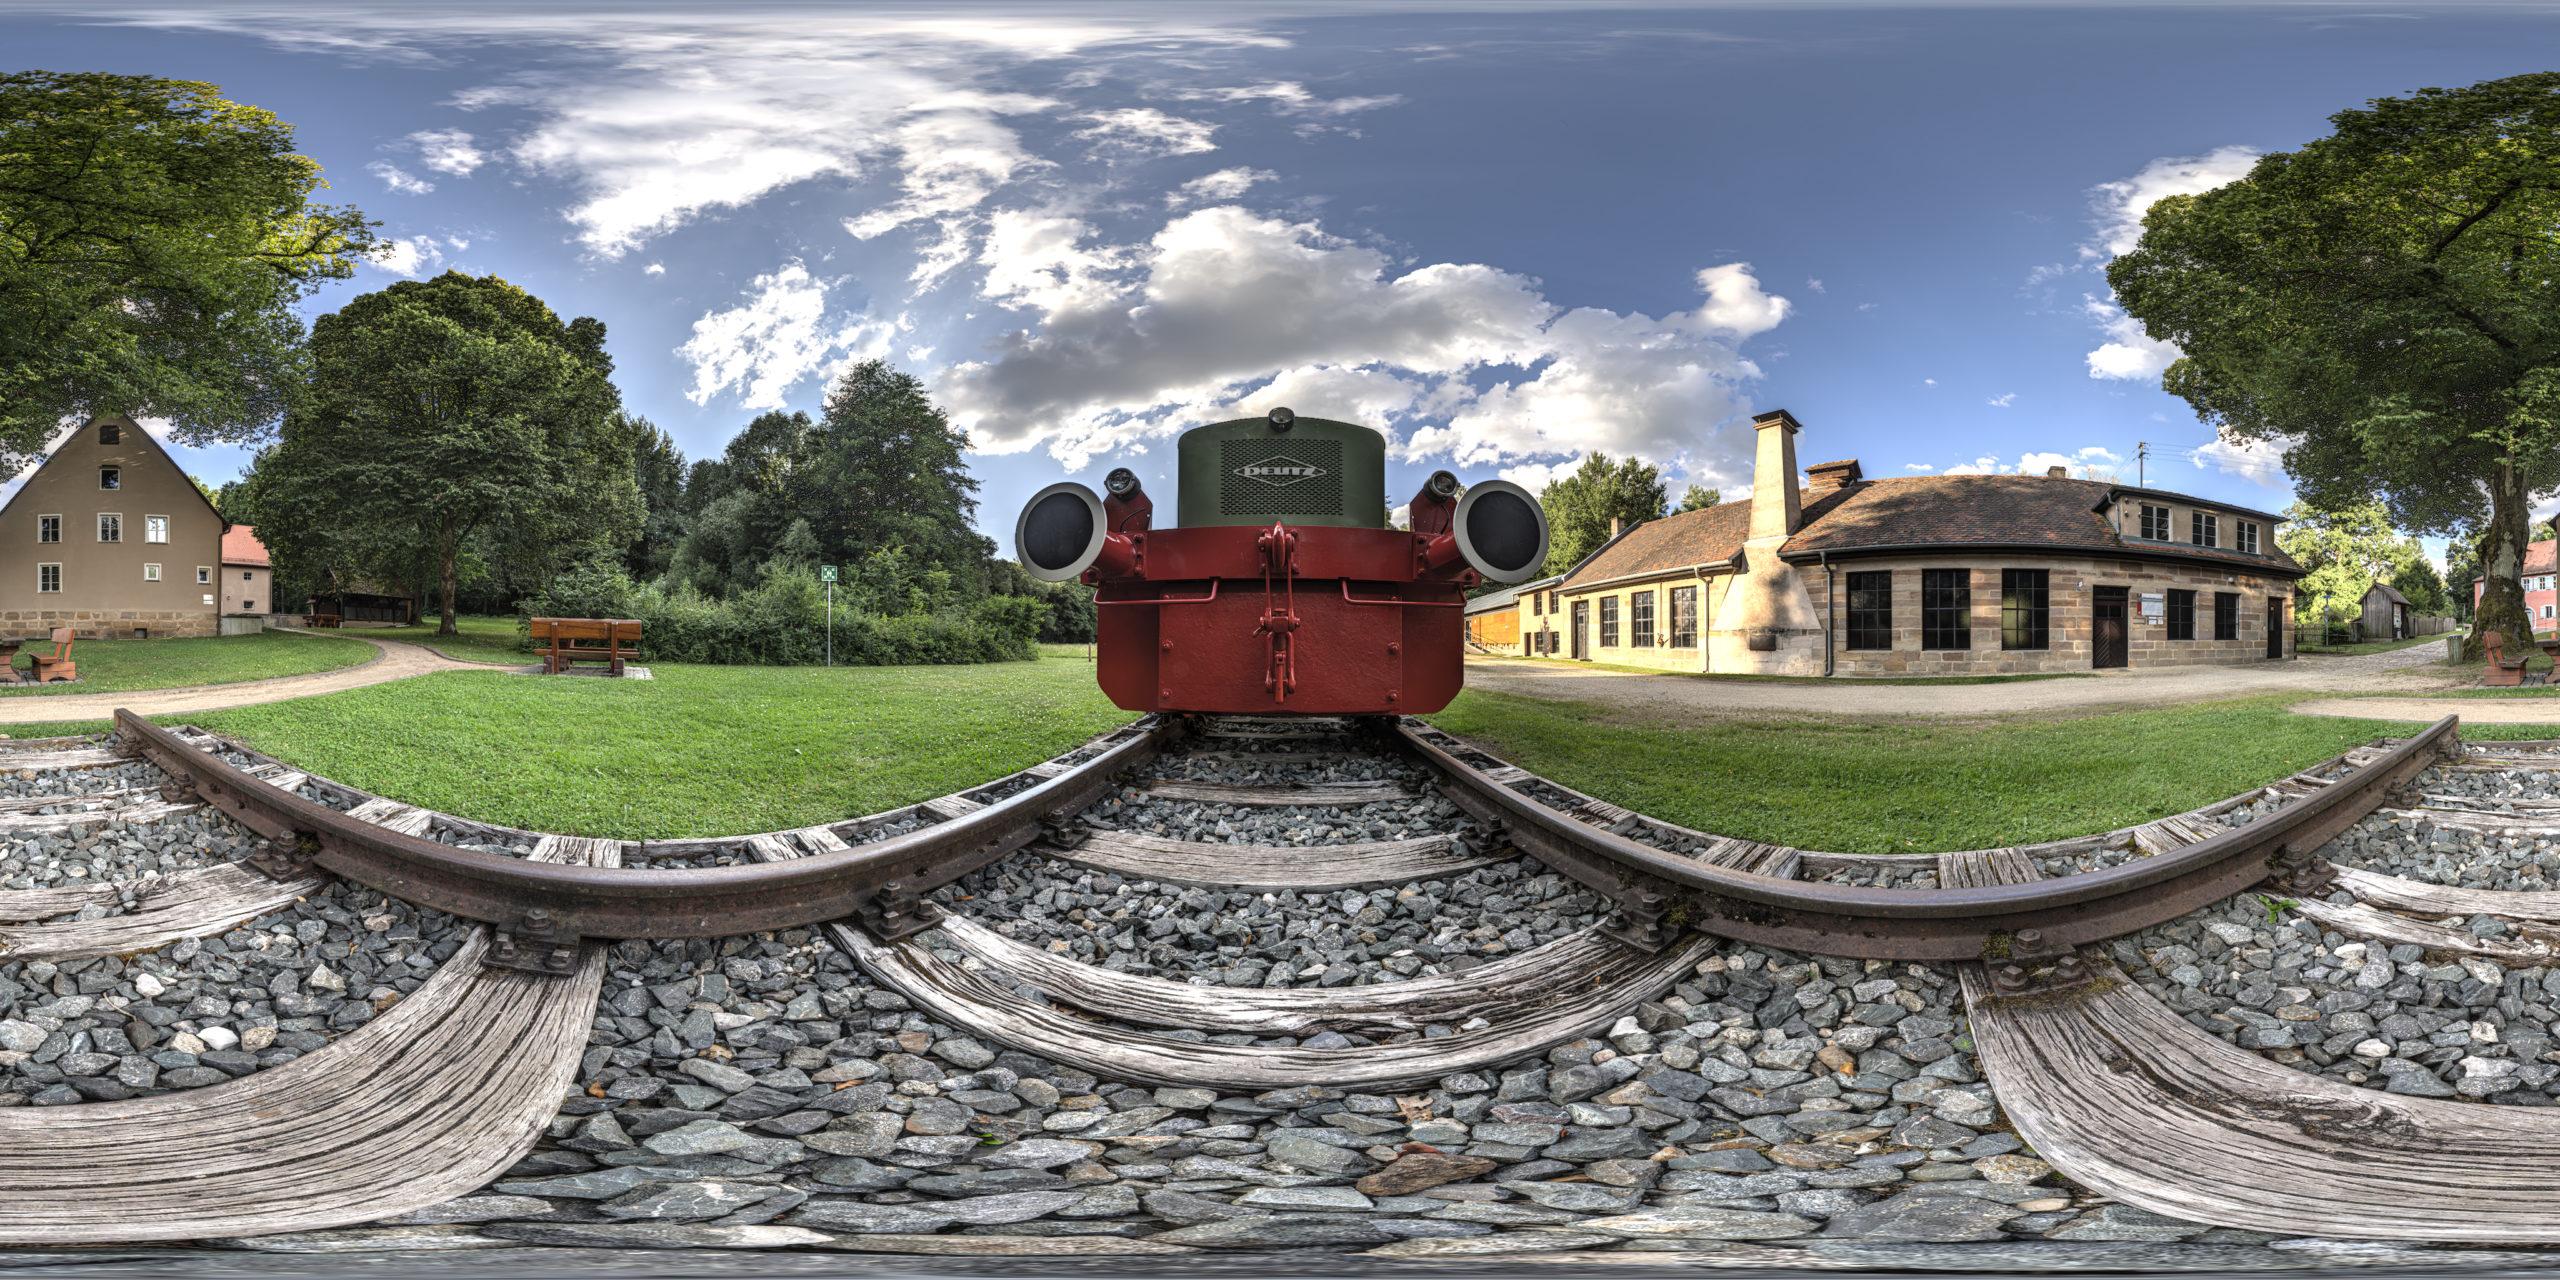 HDRI-Skies-Steam-Locomotive-Eisenhammer-Roth